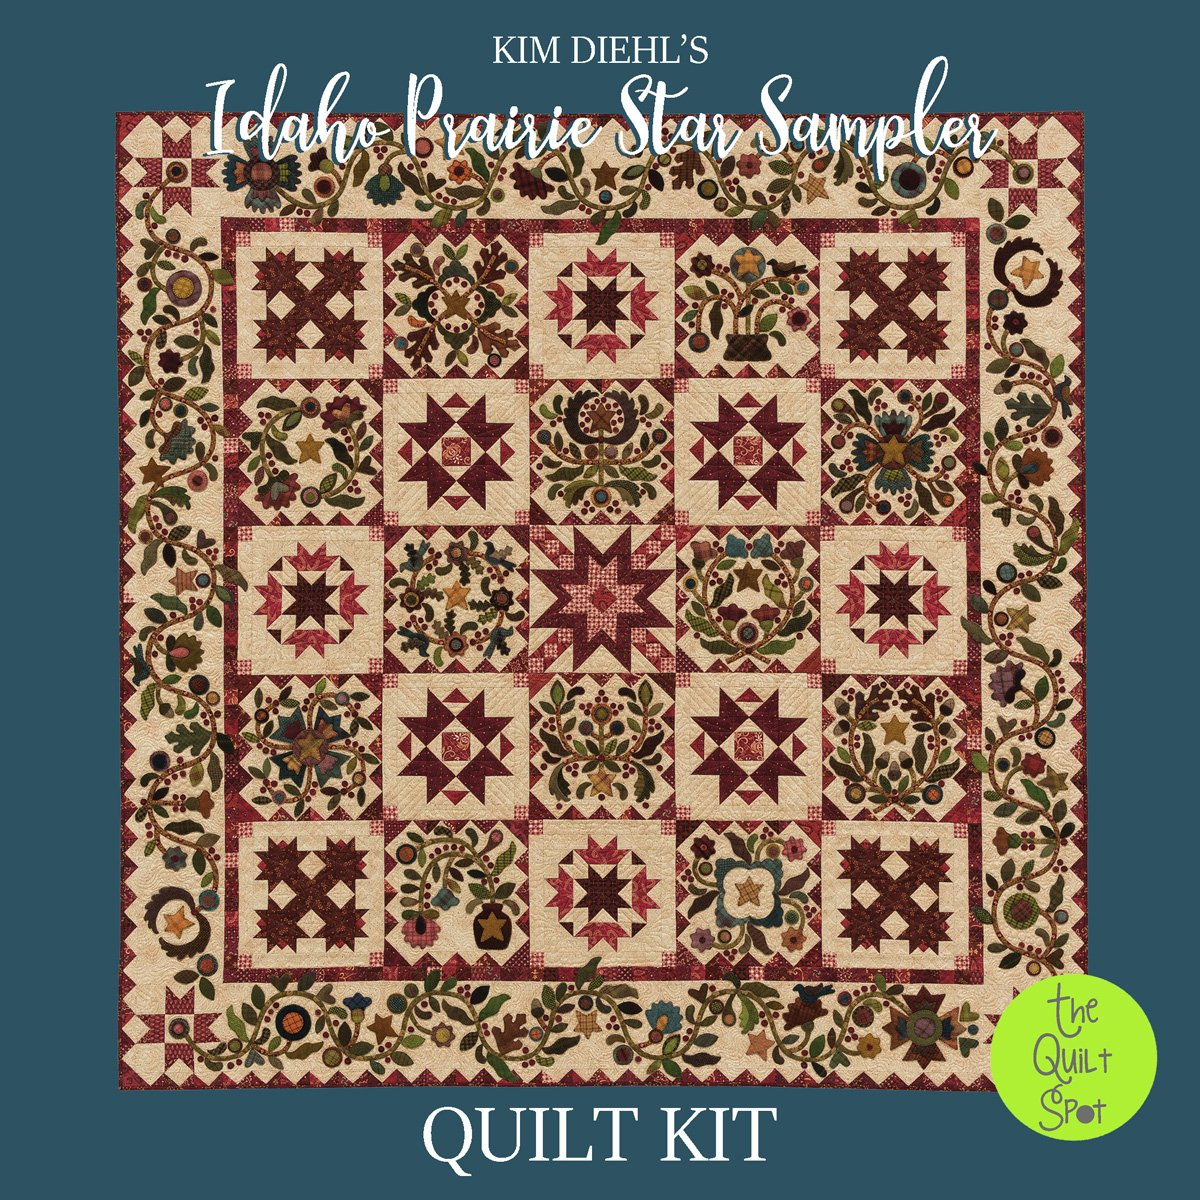 Kim Diehl's Idaho Prairie Star Quilt Kit - Fabric & Wool Kit Only (Book Sold Separately)